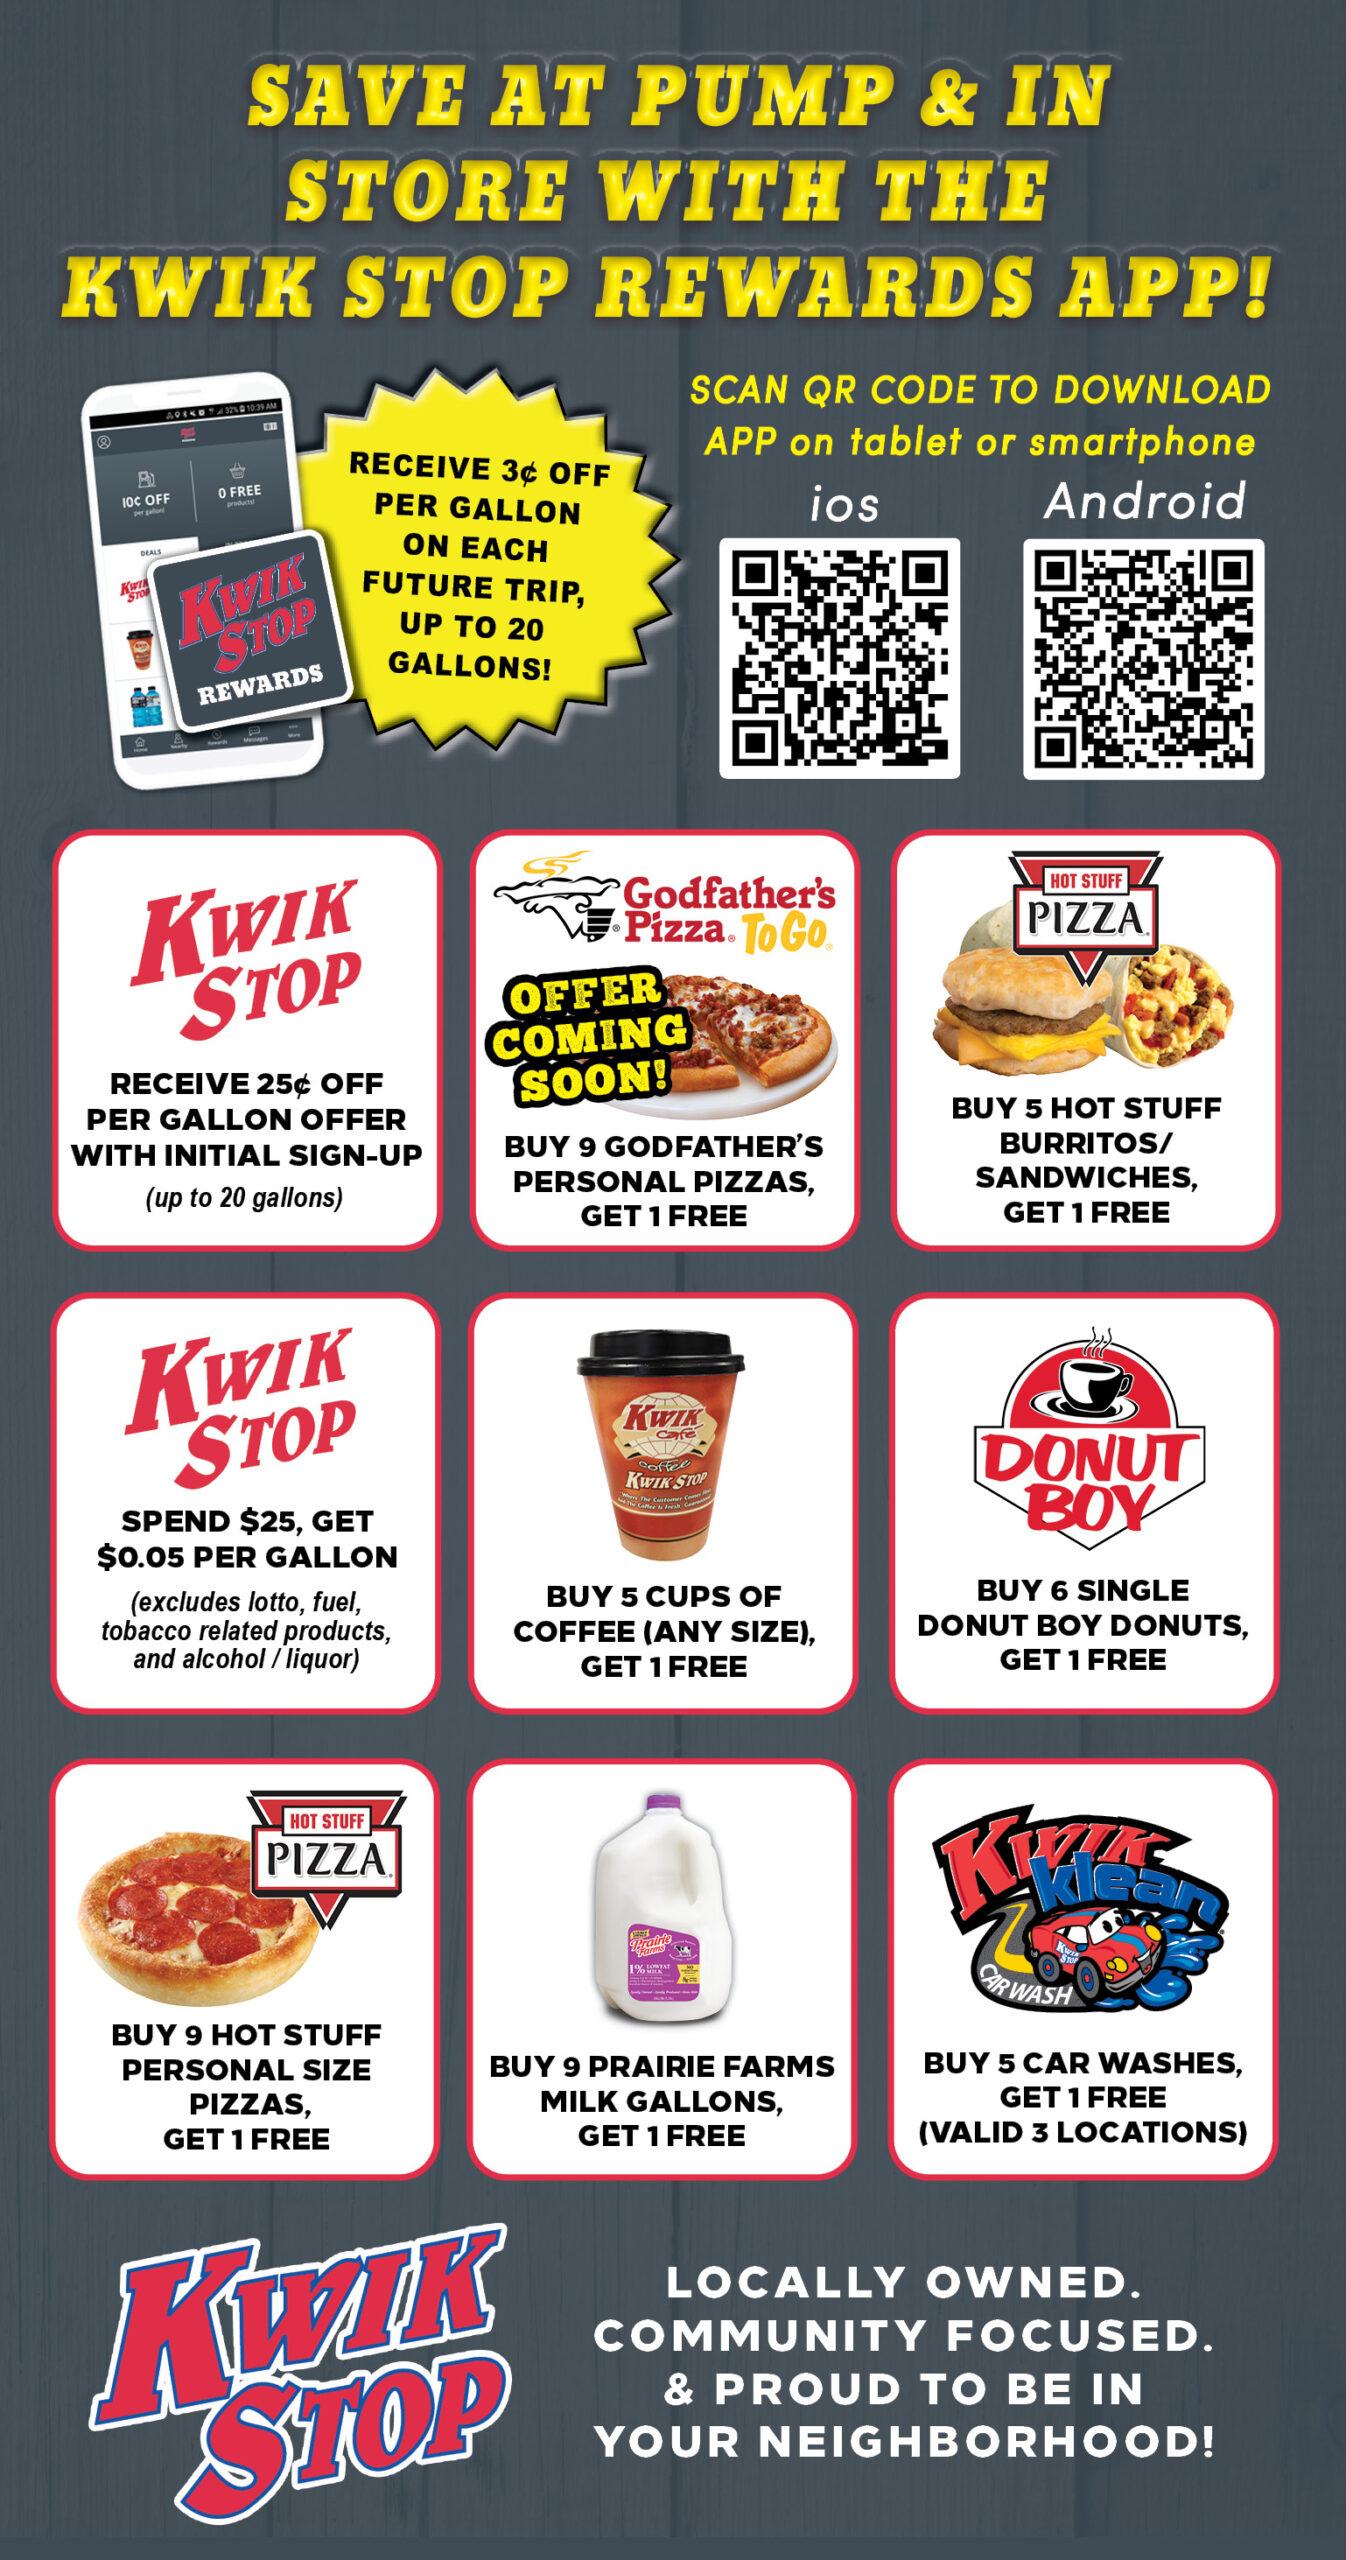 Kwik Stop Rewards Offer